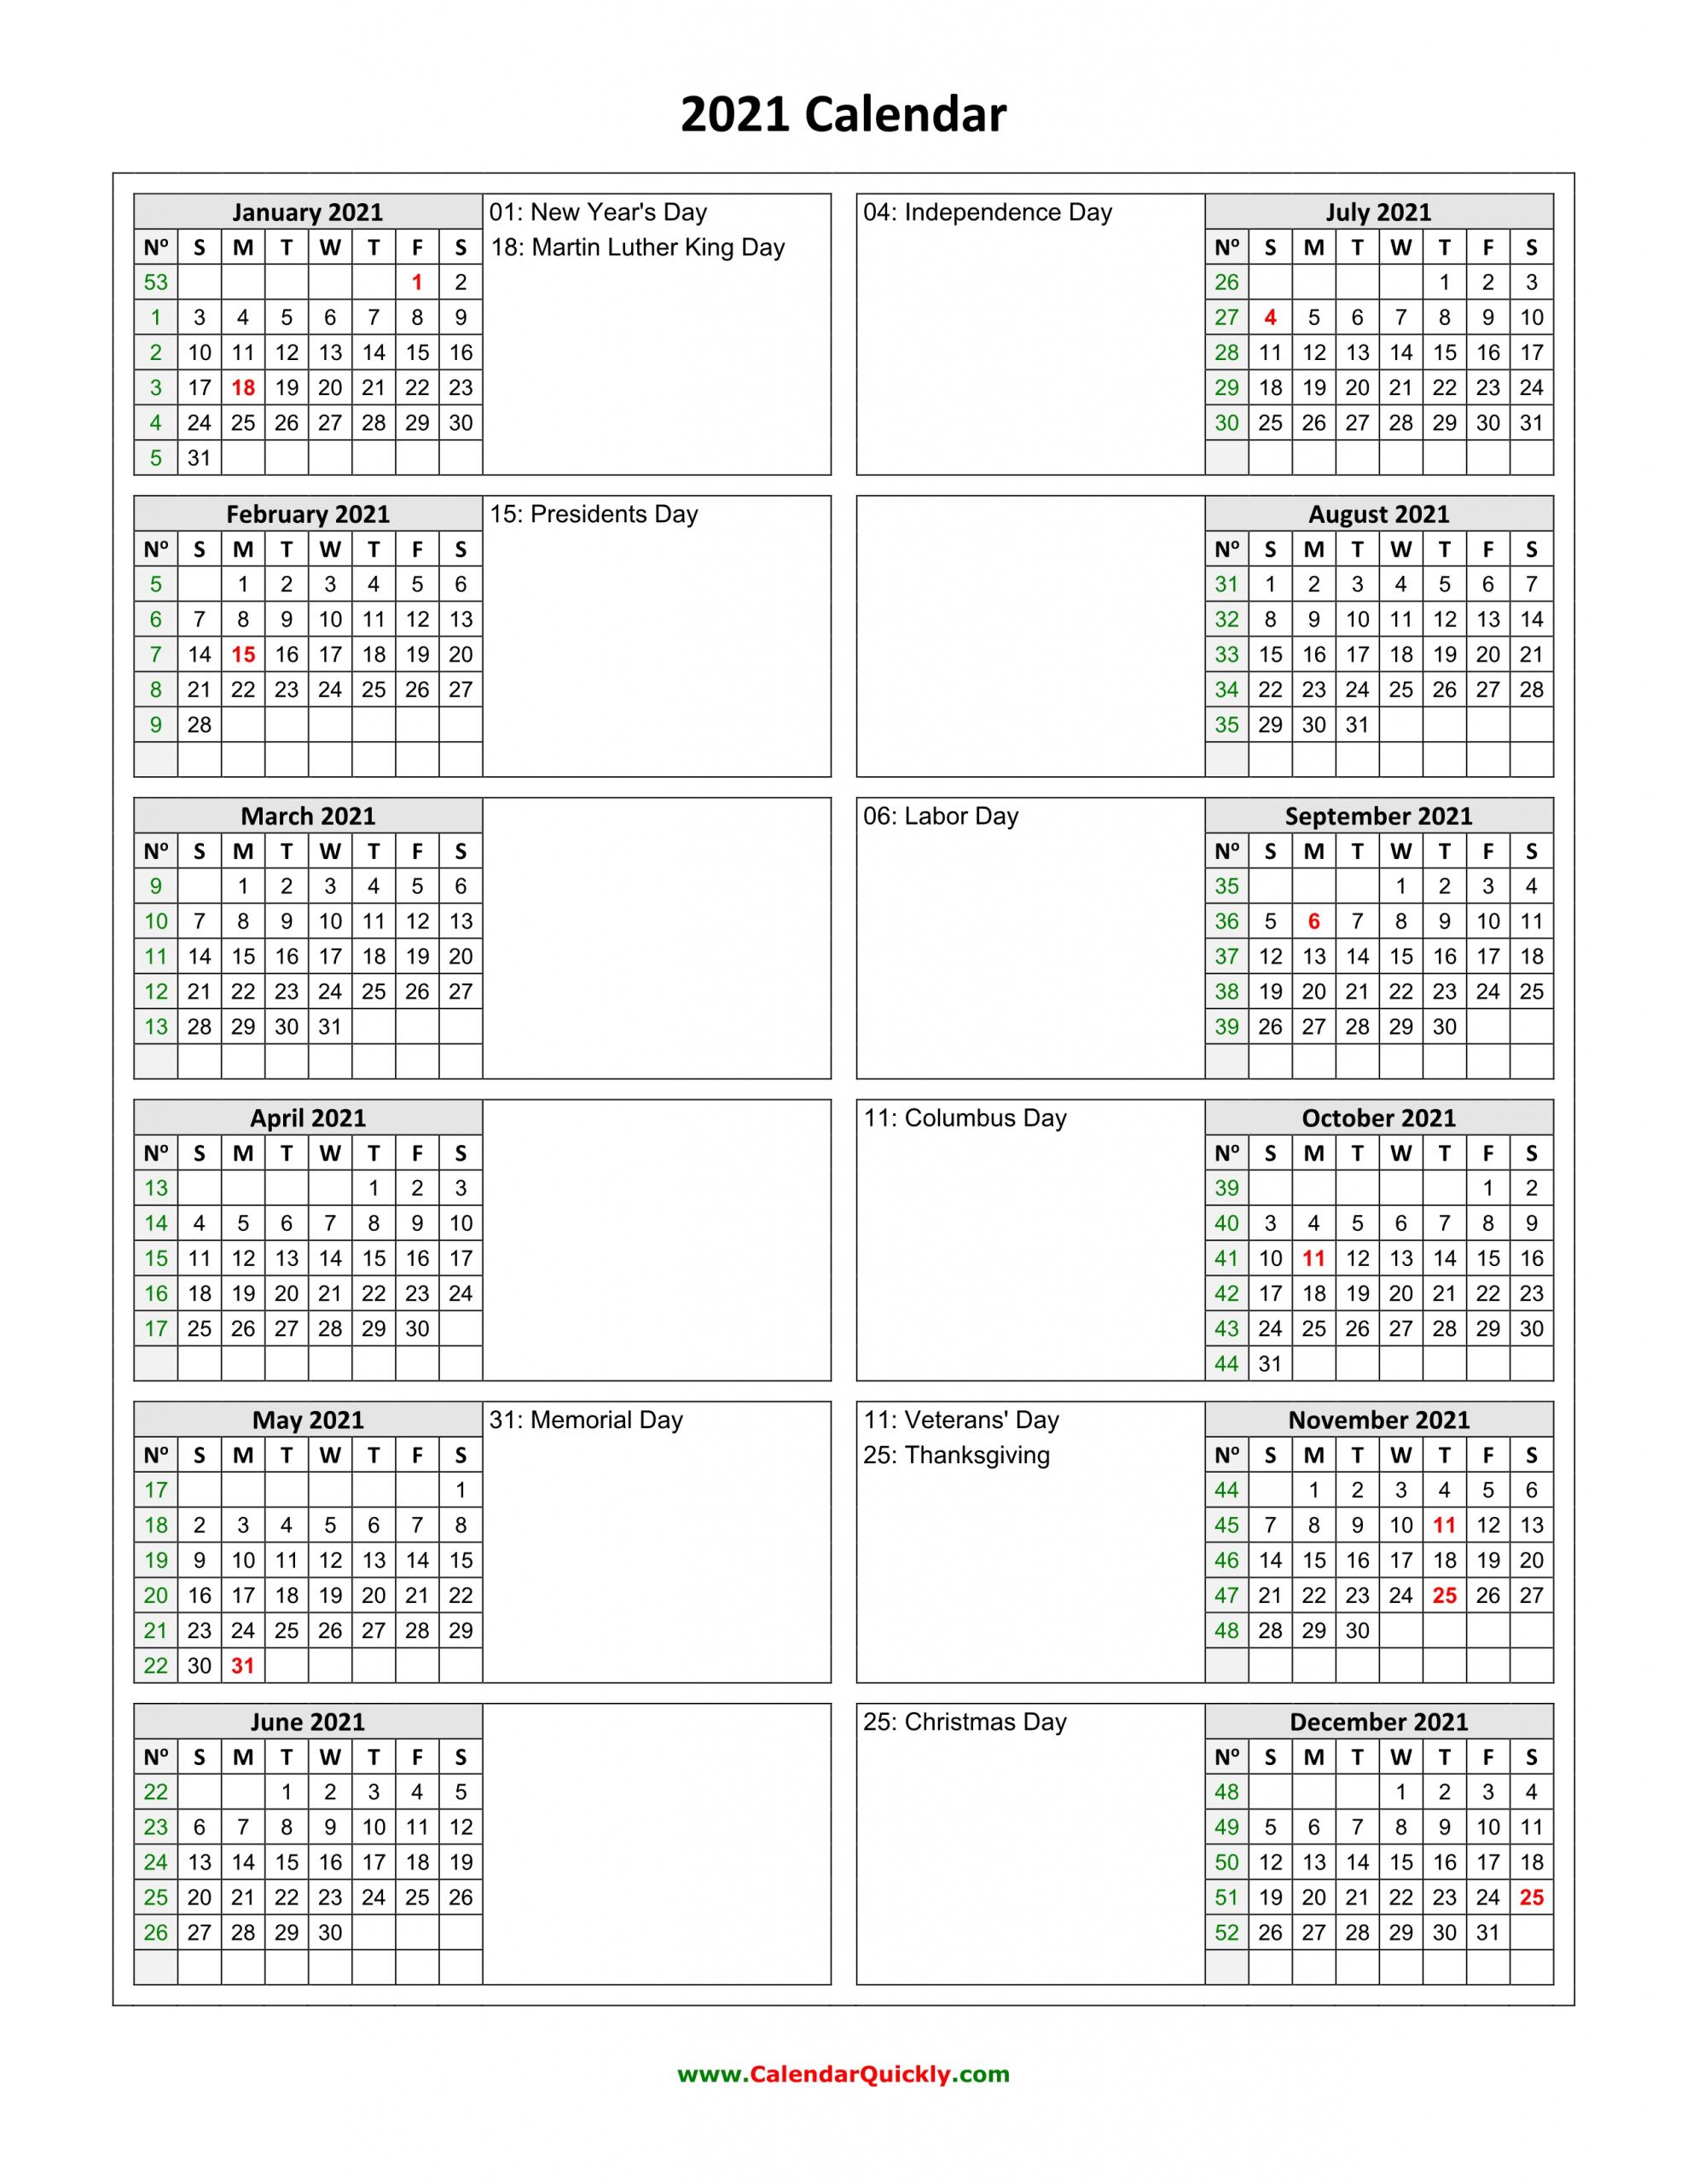 Holidays Calendar 2021 Vertical   Calendar Quickly